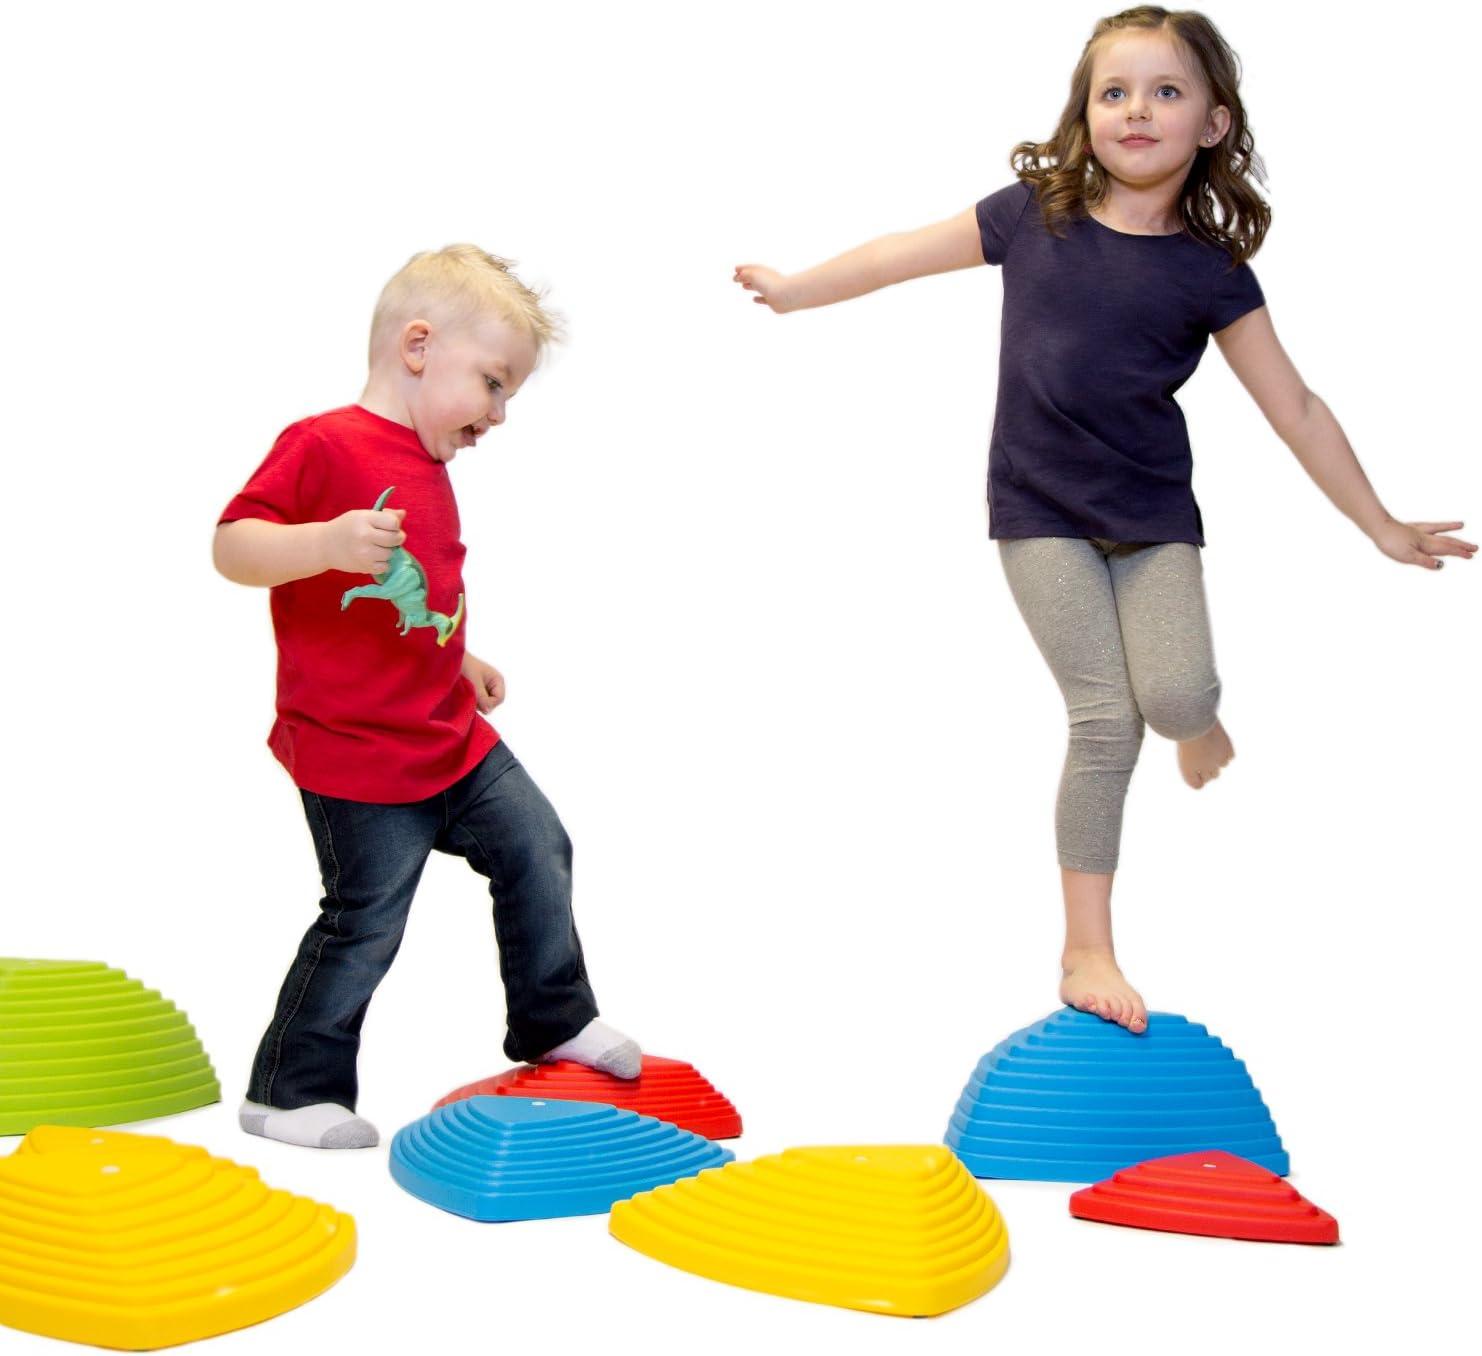 Green Hemispheres Stepping Stone Kids Balance Pods Sport Activity Game Toy